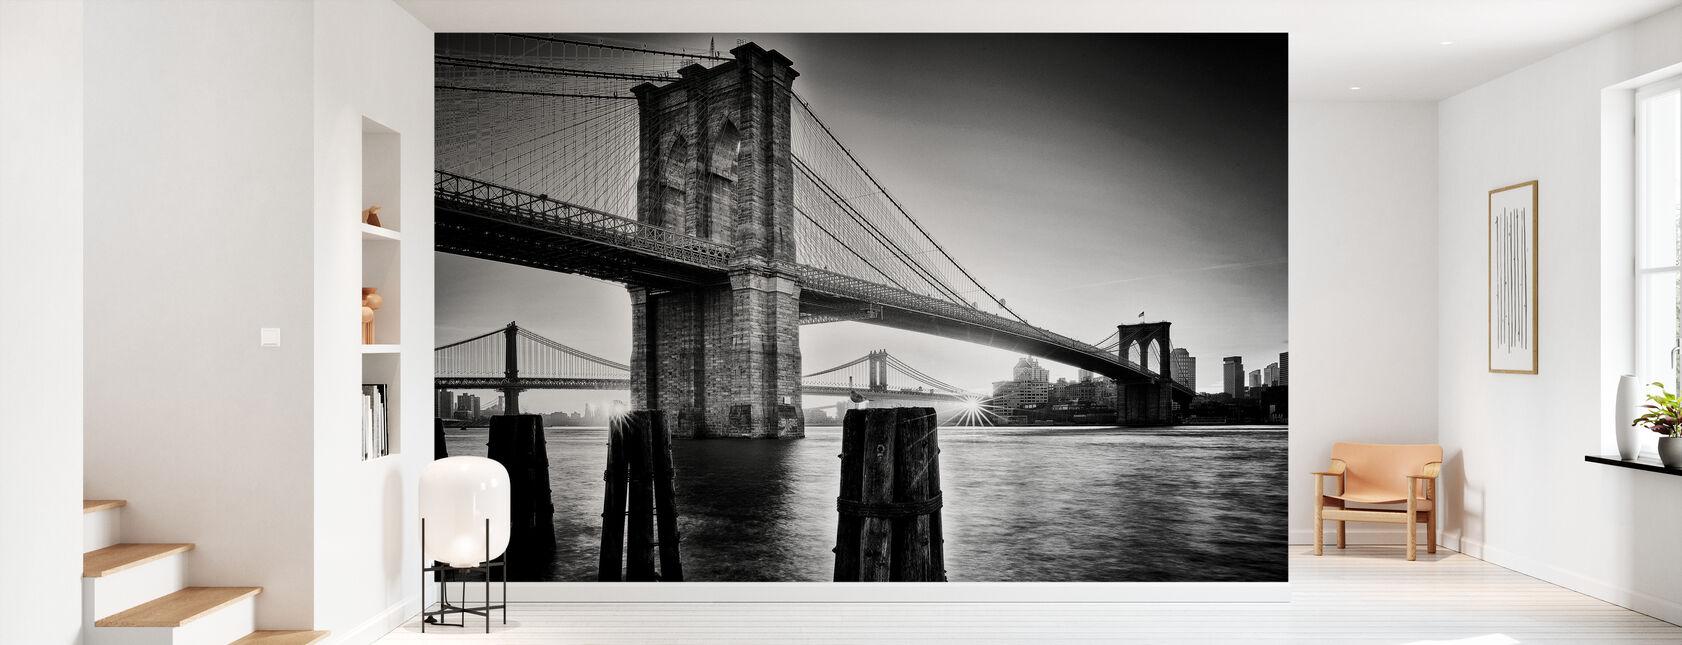 Brooklyn Bridge Sunrise - Wallpaper - Hallway